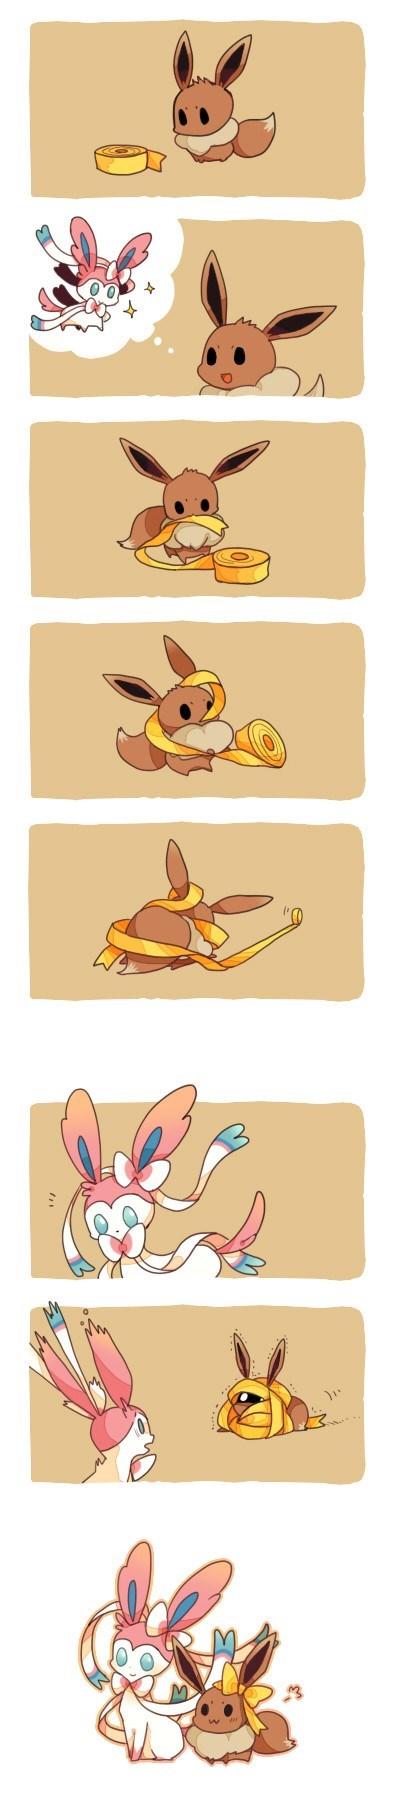 Pokémon eevee - 8995137536